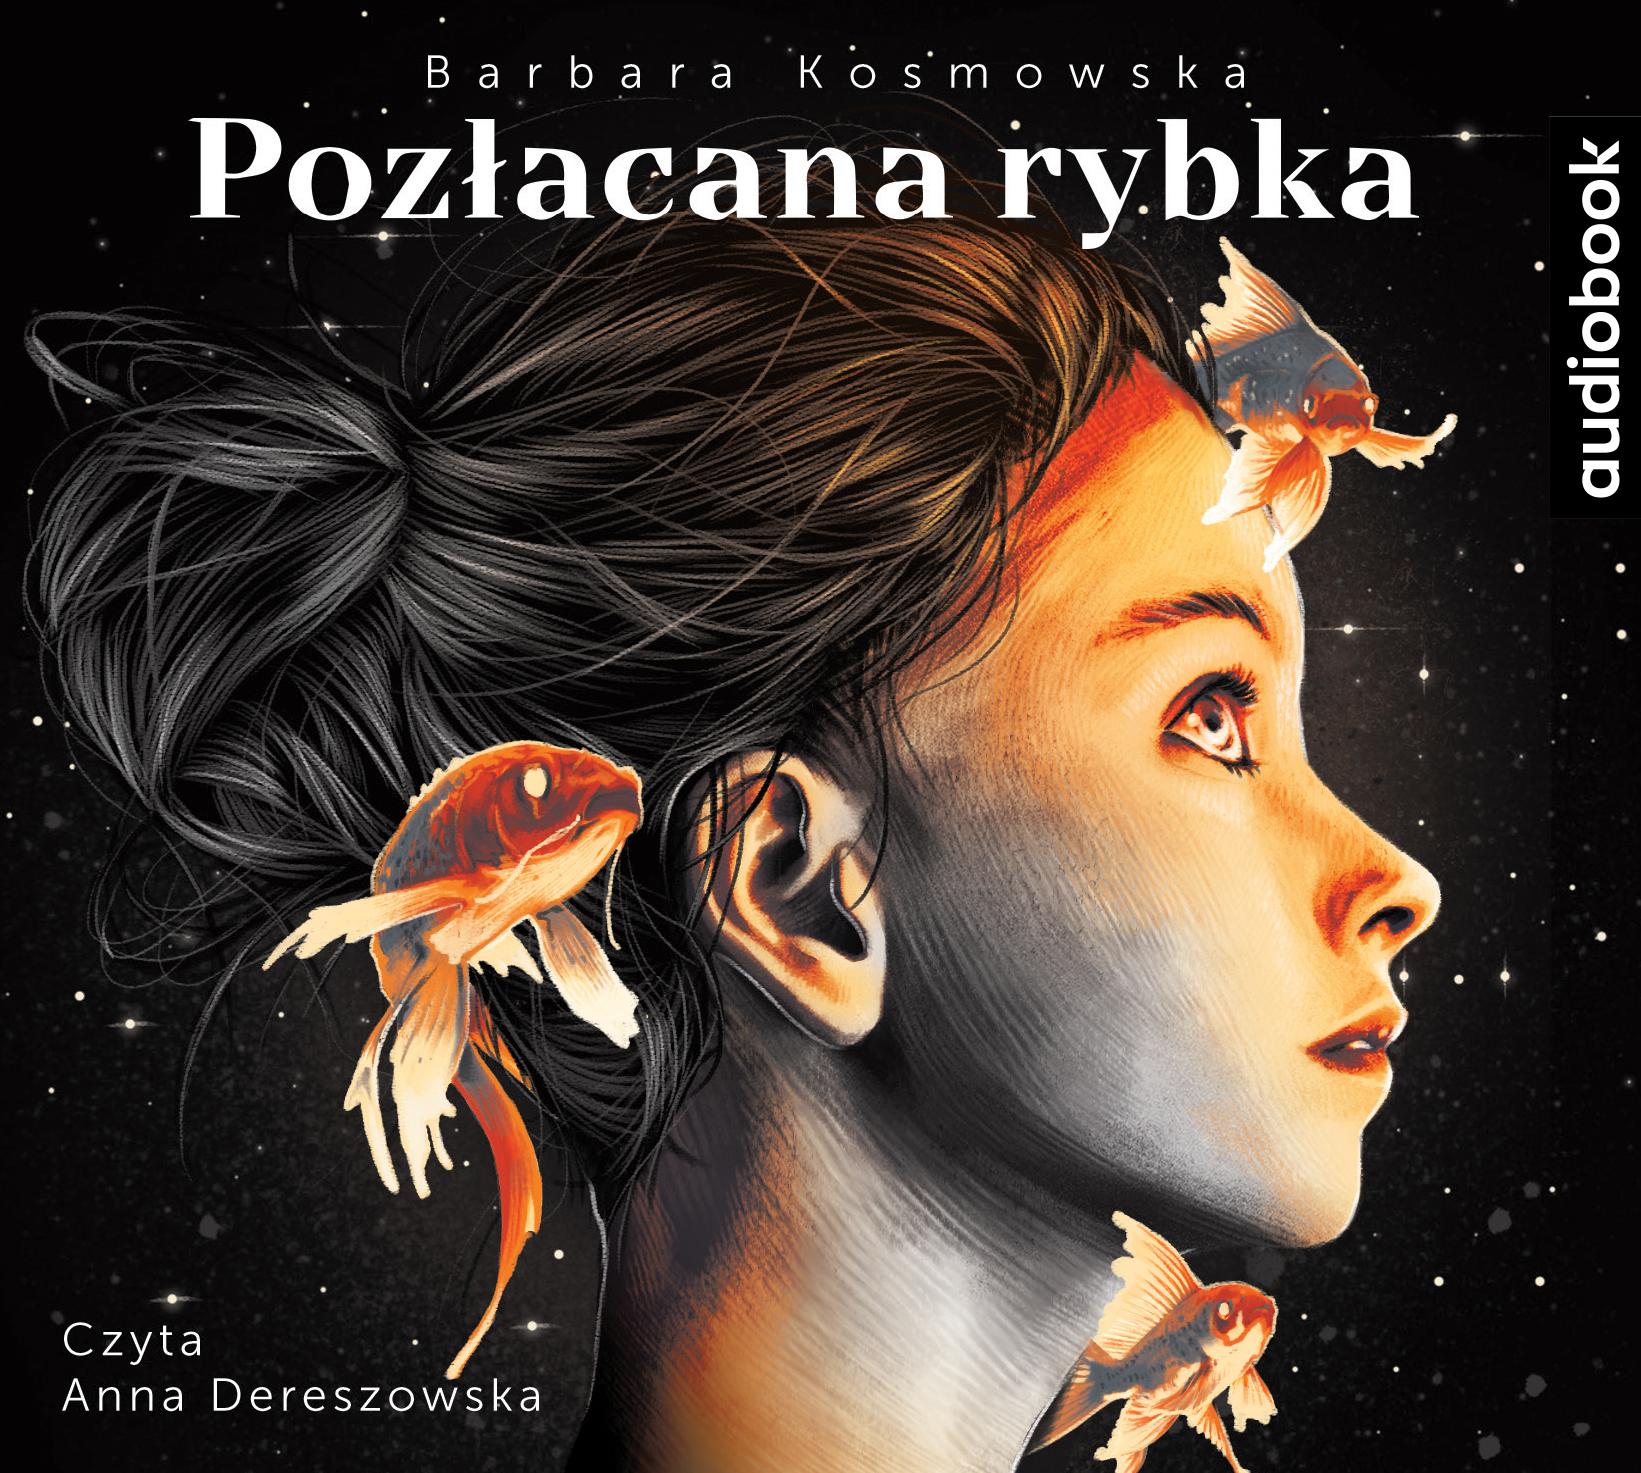 Kosmowska Barbara – Pozłacana Rybka